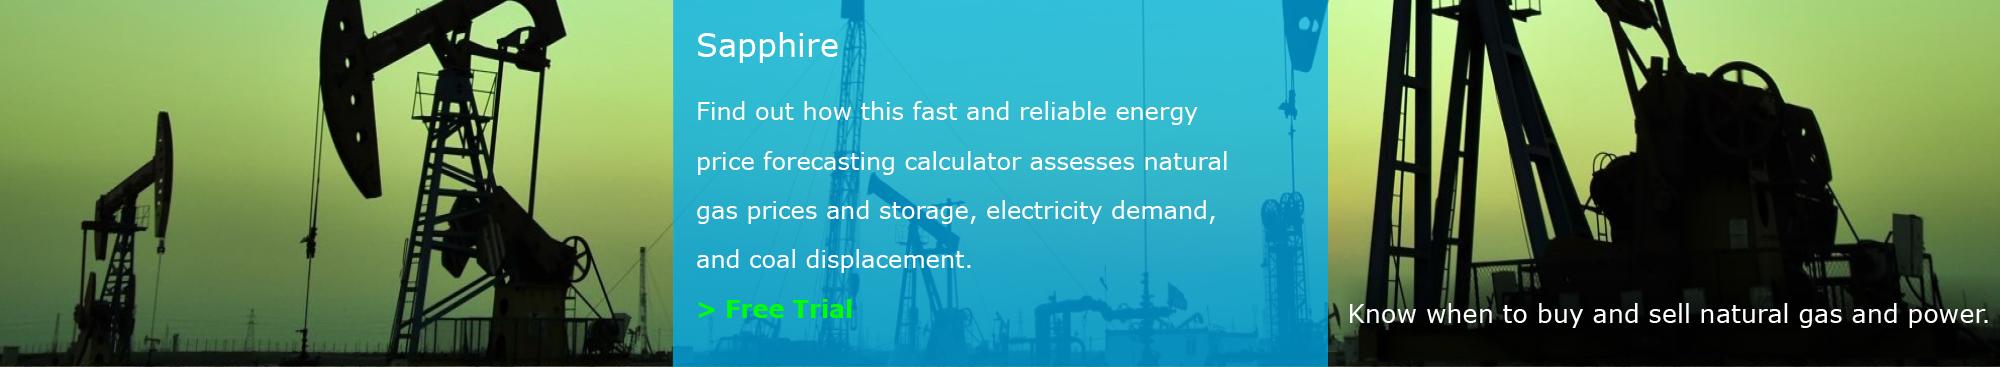 Energy Price Forecasting Calculator — EBW AnalyticsGroup